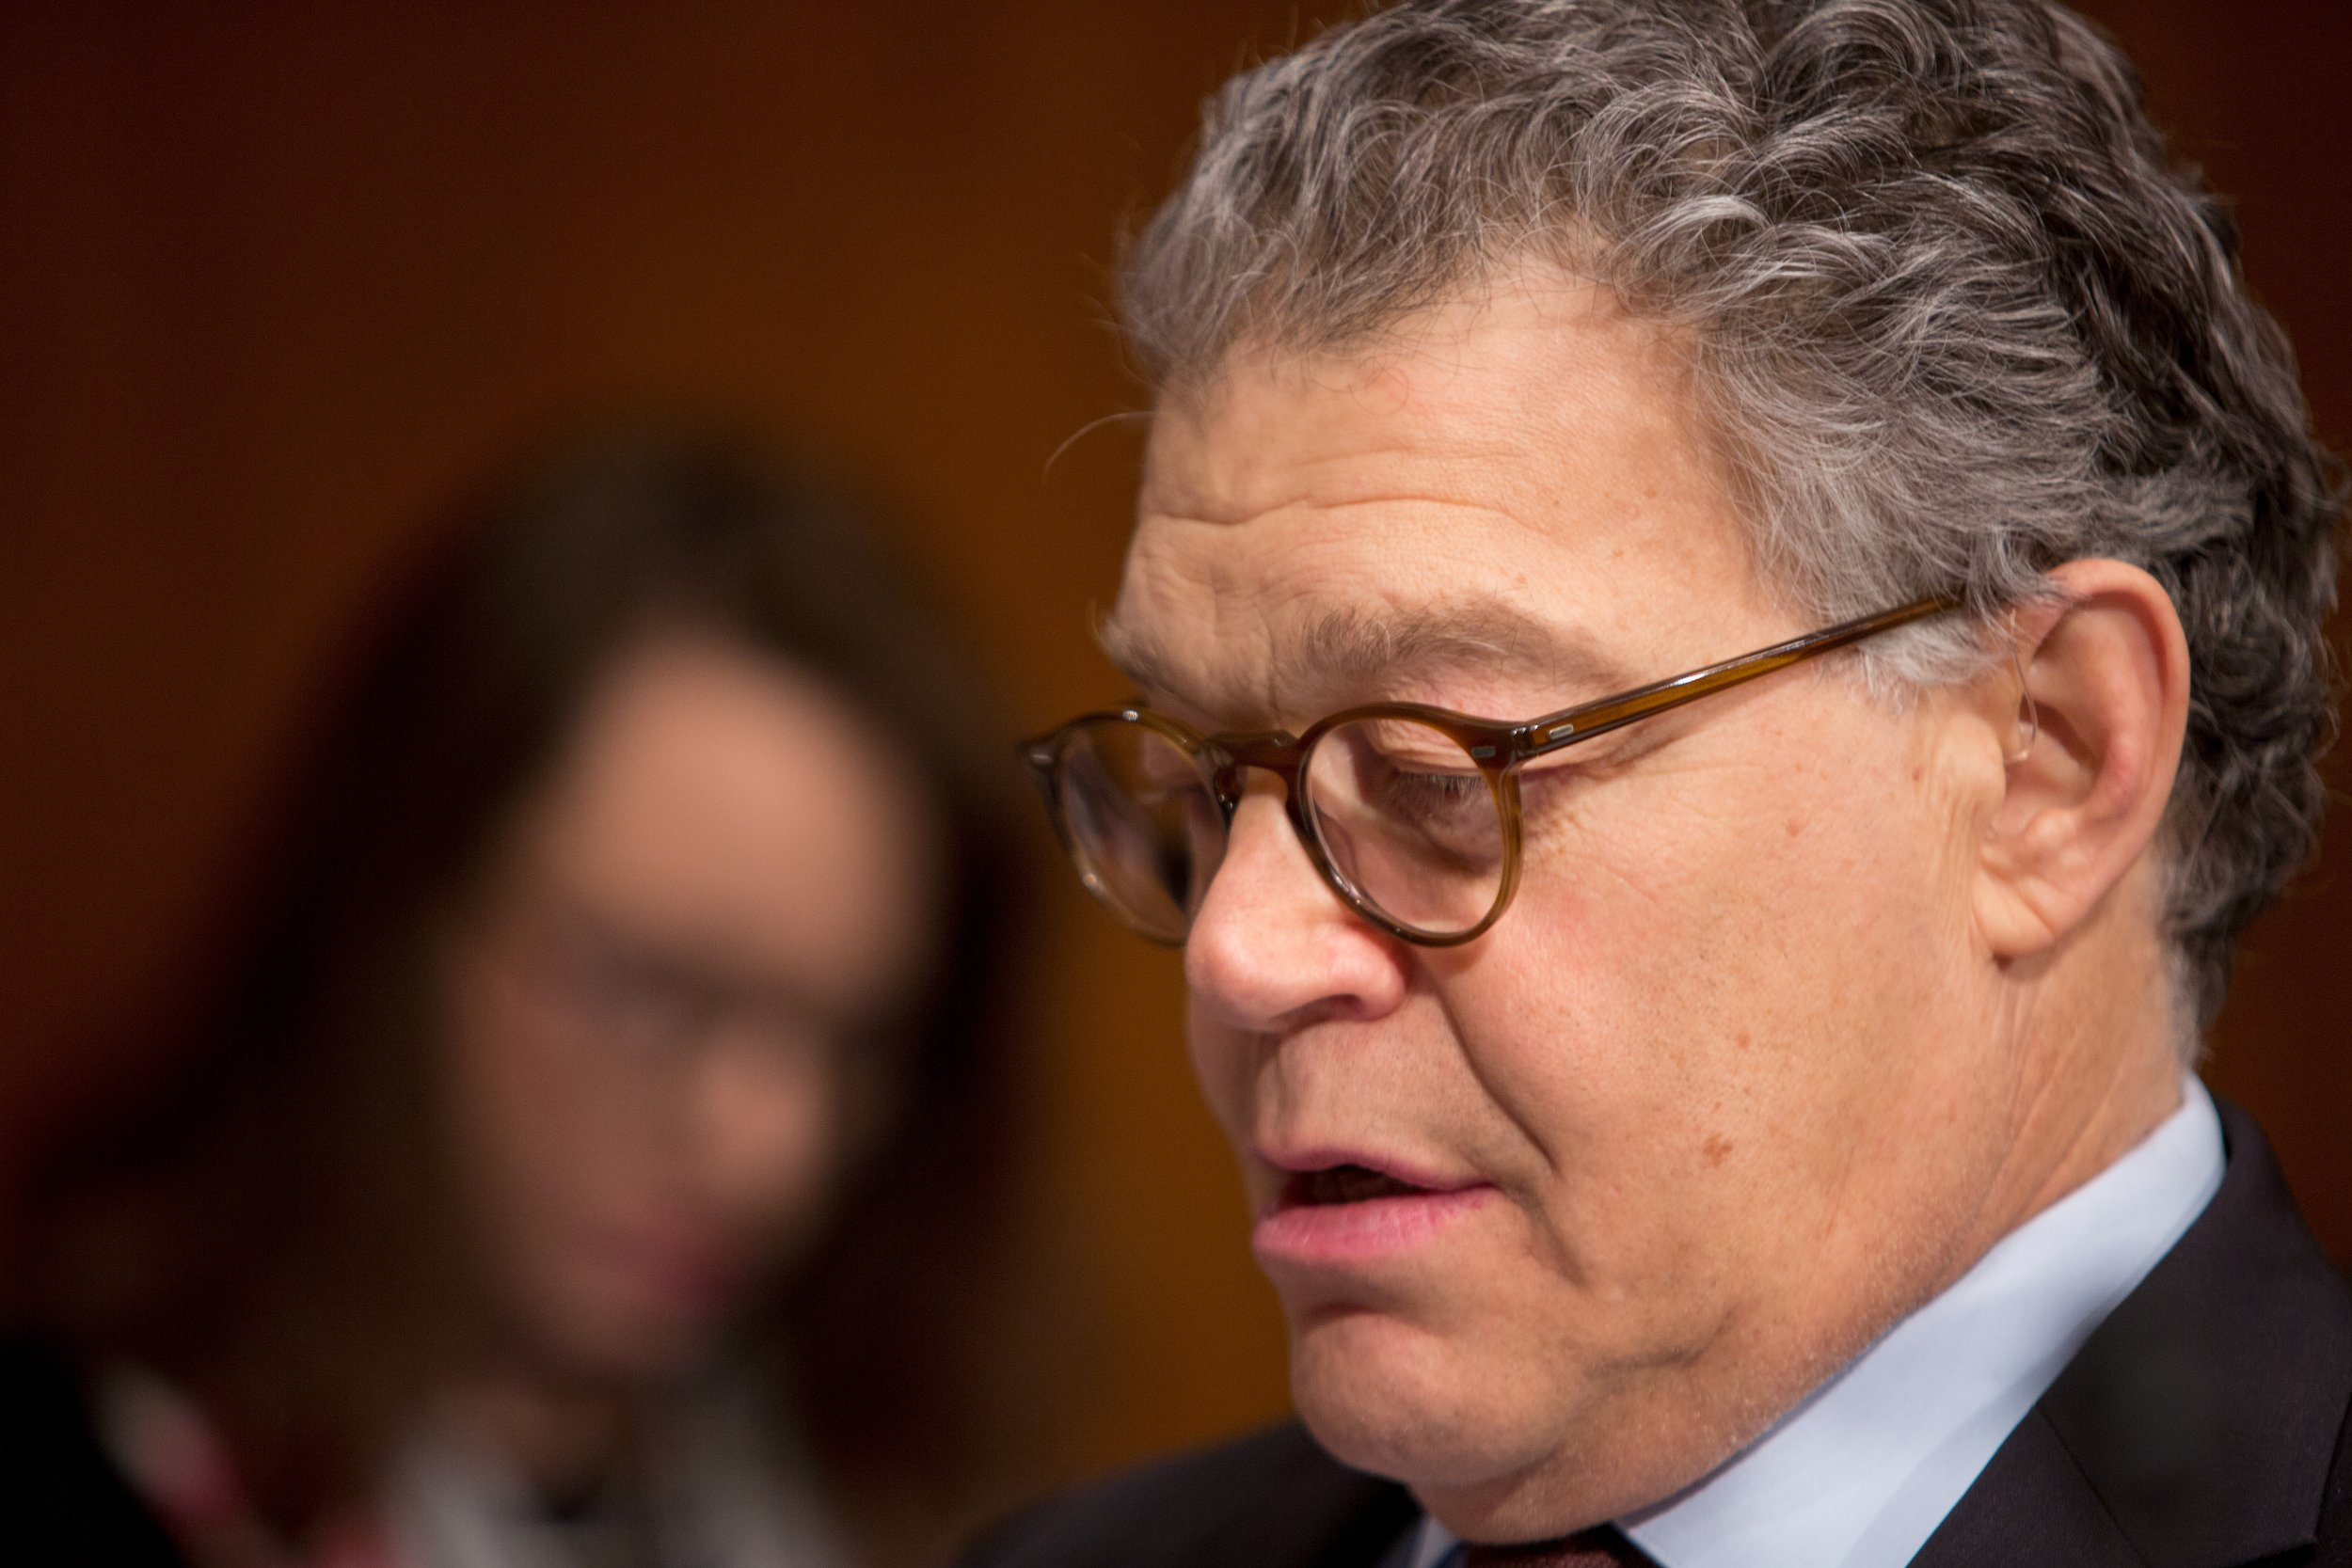 Minnesota Senator Amy Klobuchar thinks Al Franken will make a comeback